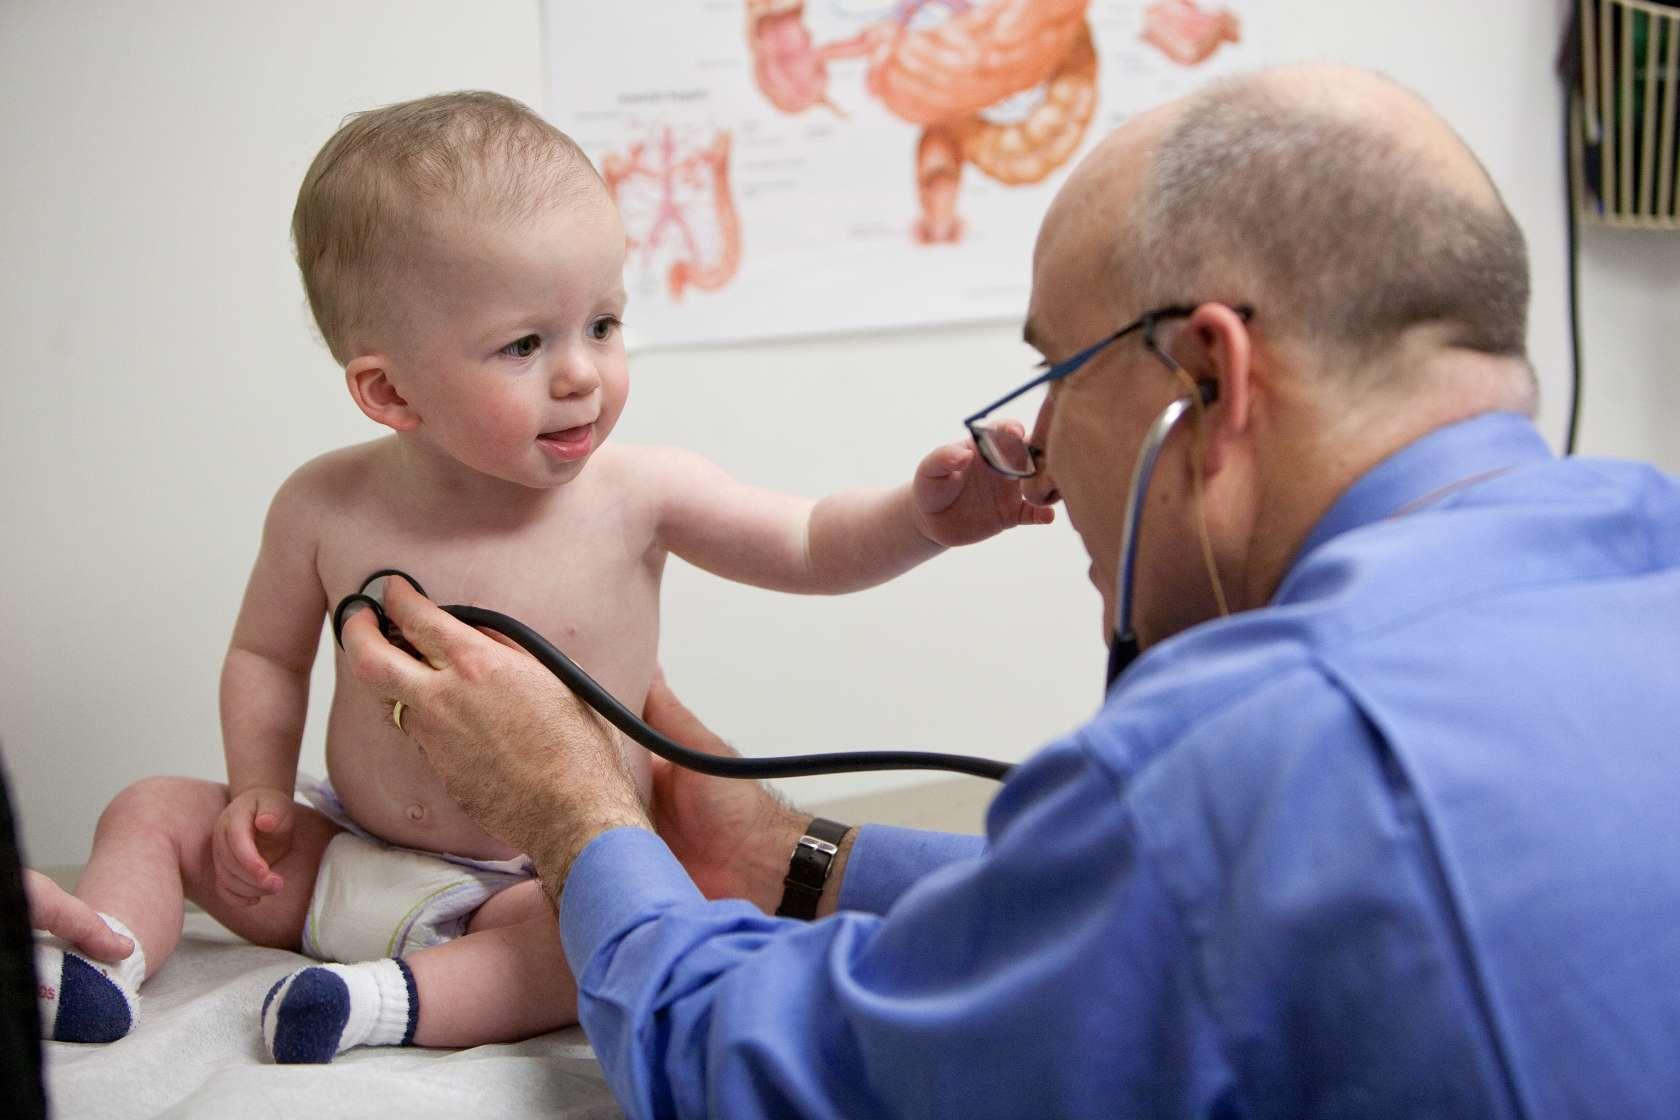 Jim Beau Reinhardt recieves a check up from University of Florida pediatric surgeon David W. Kays, M.D.